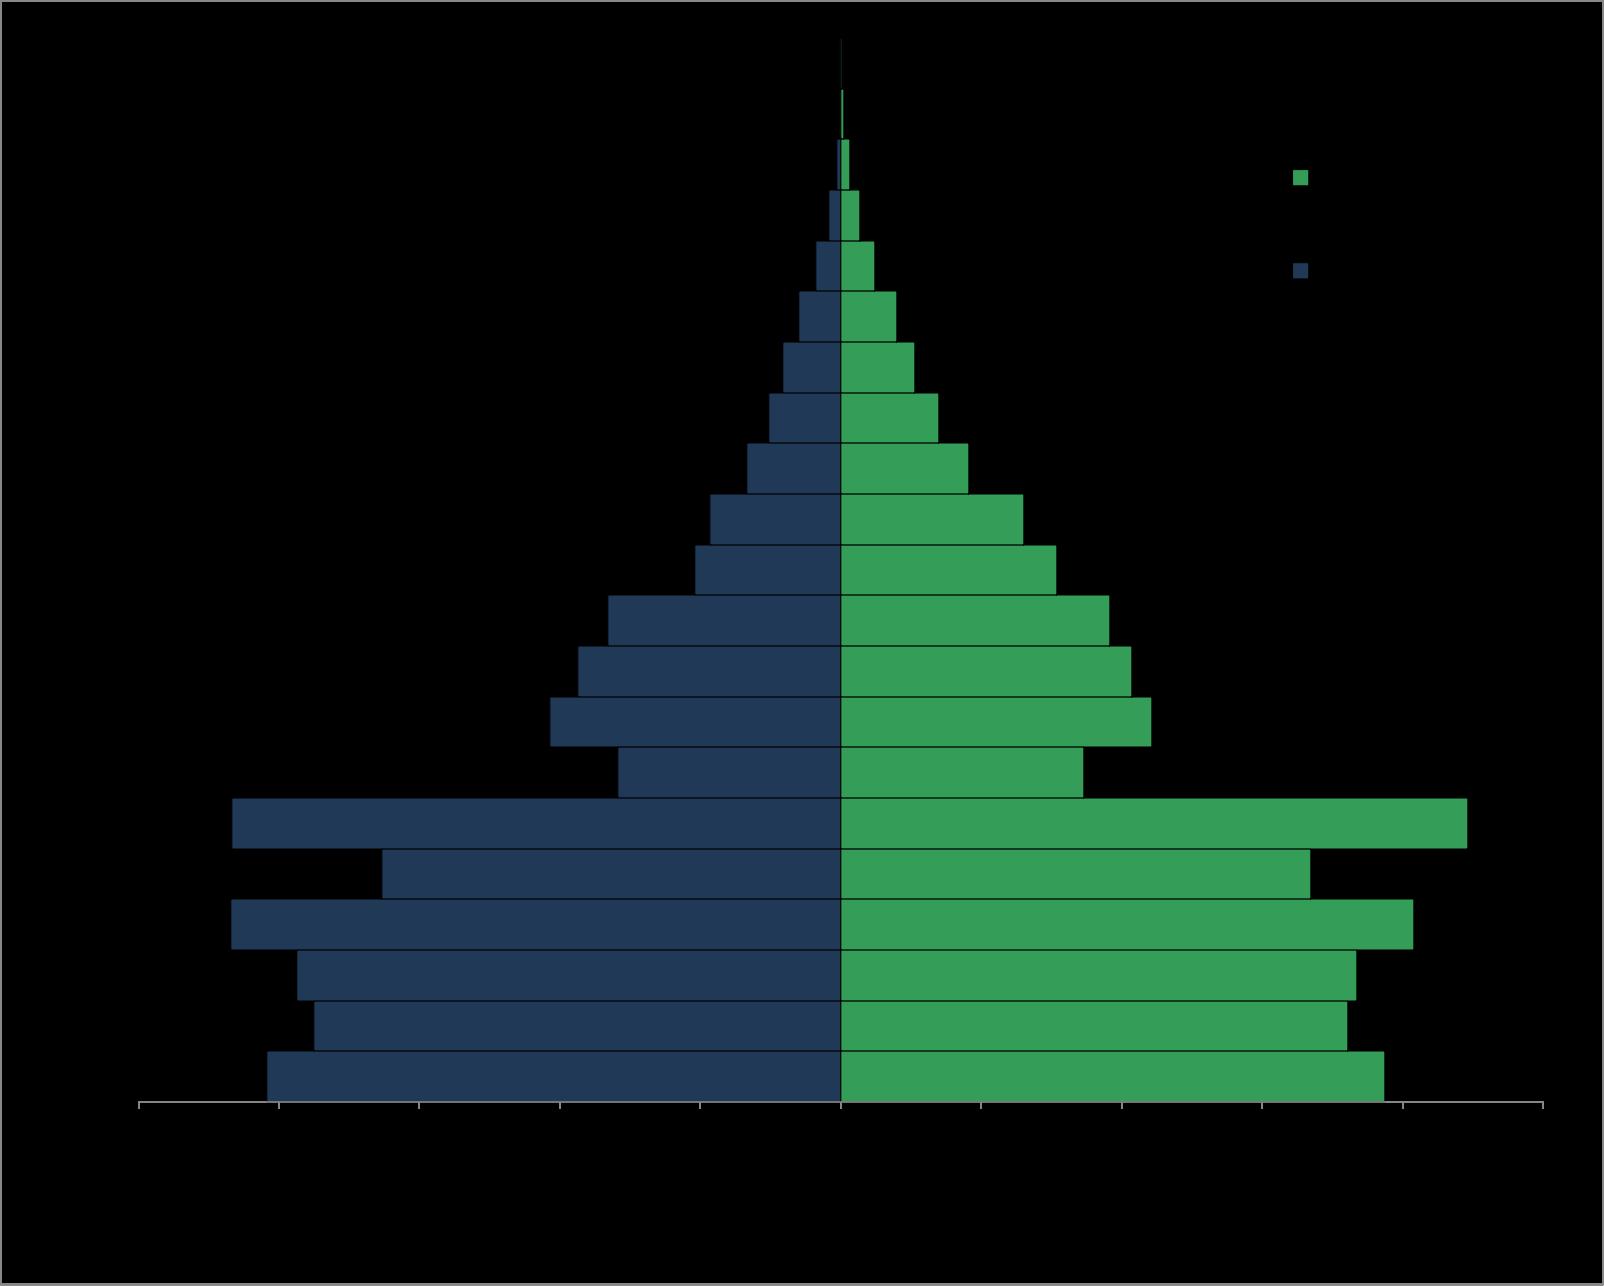 Figure 1. Population pyramid for Cambodia ( Source )